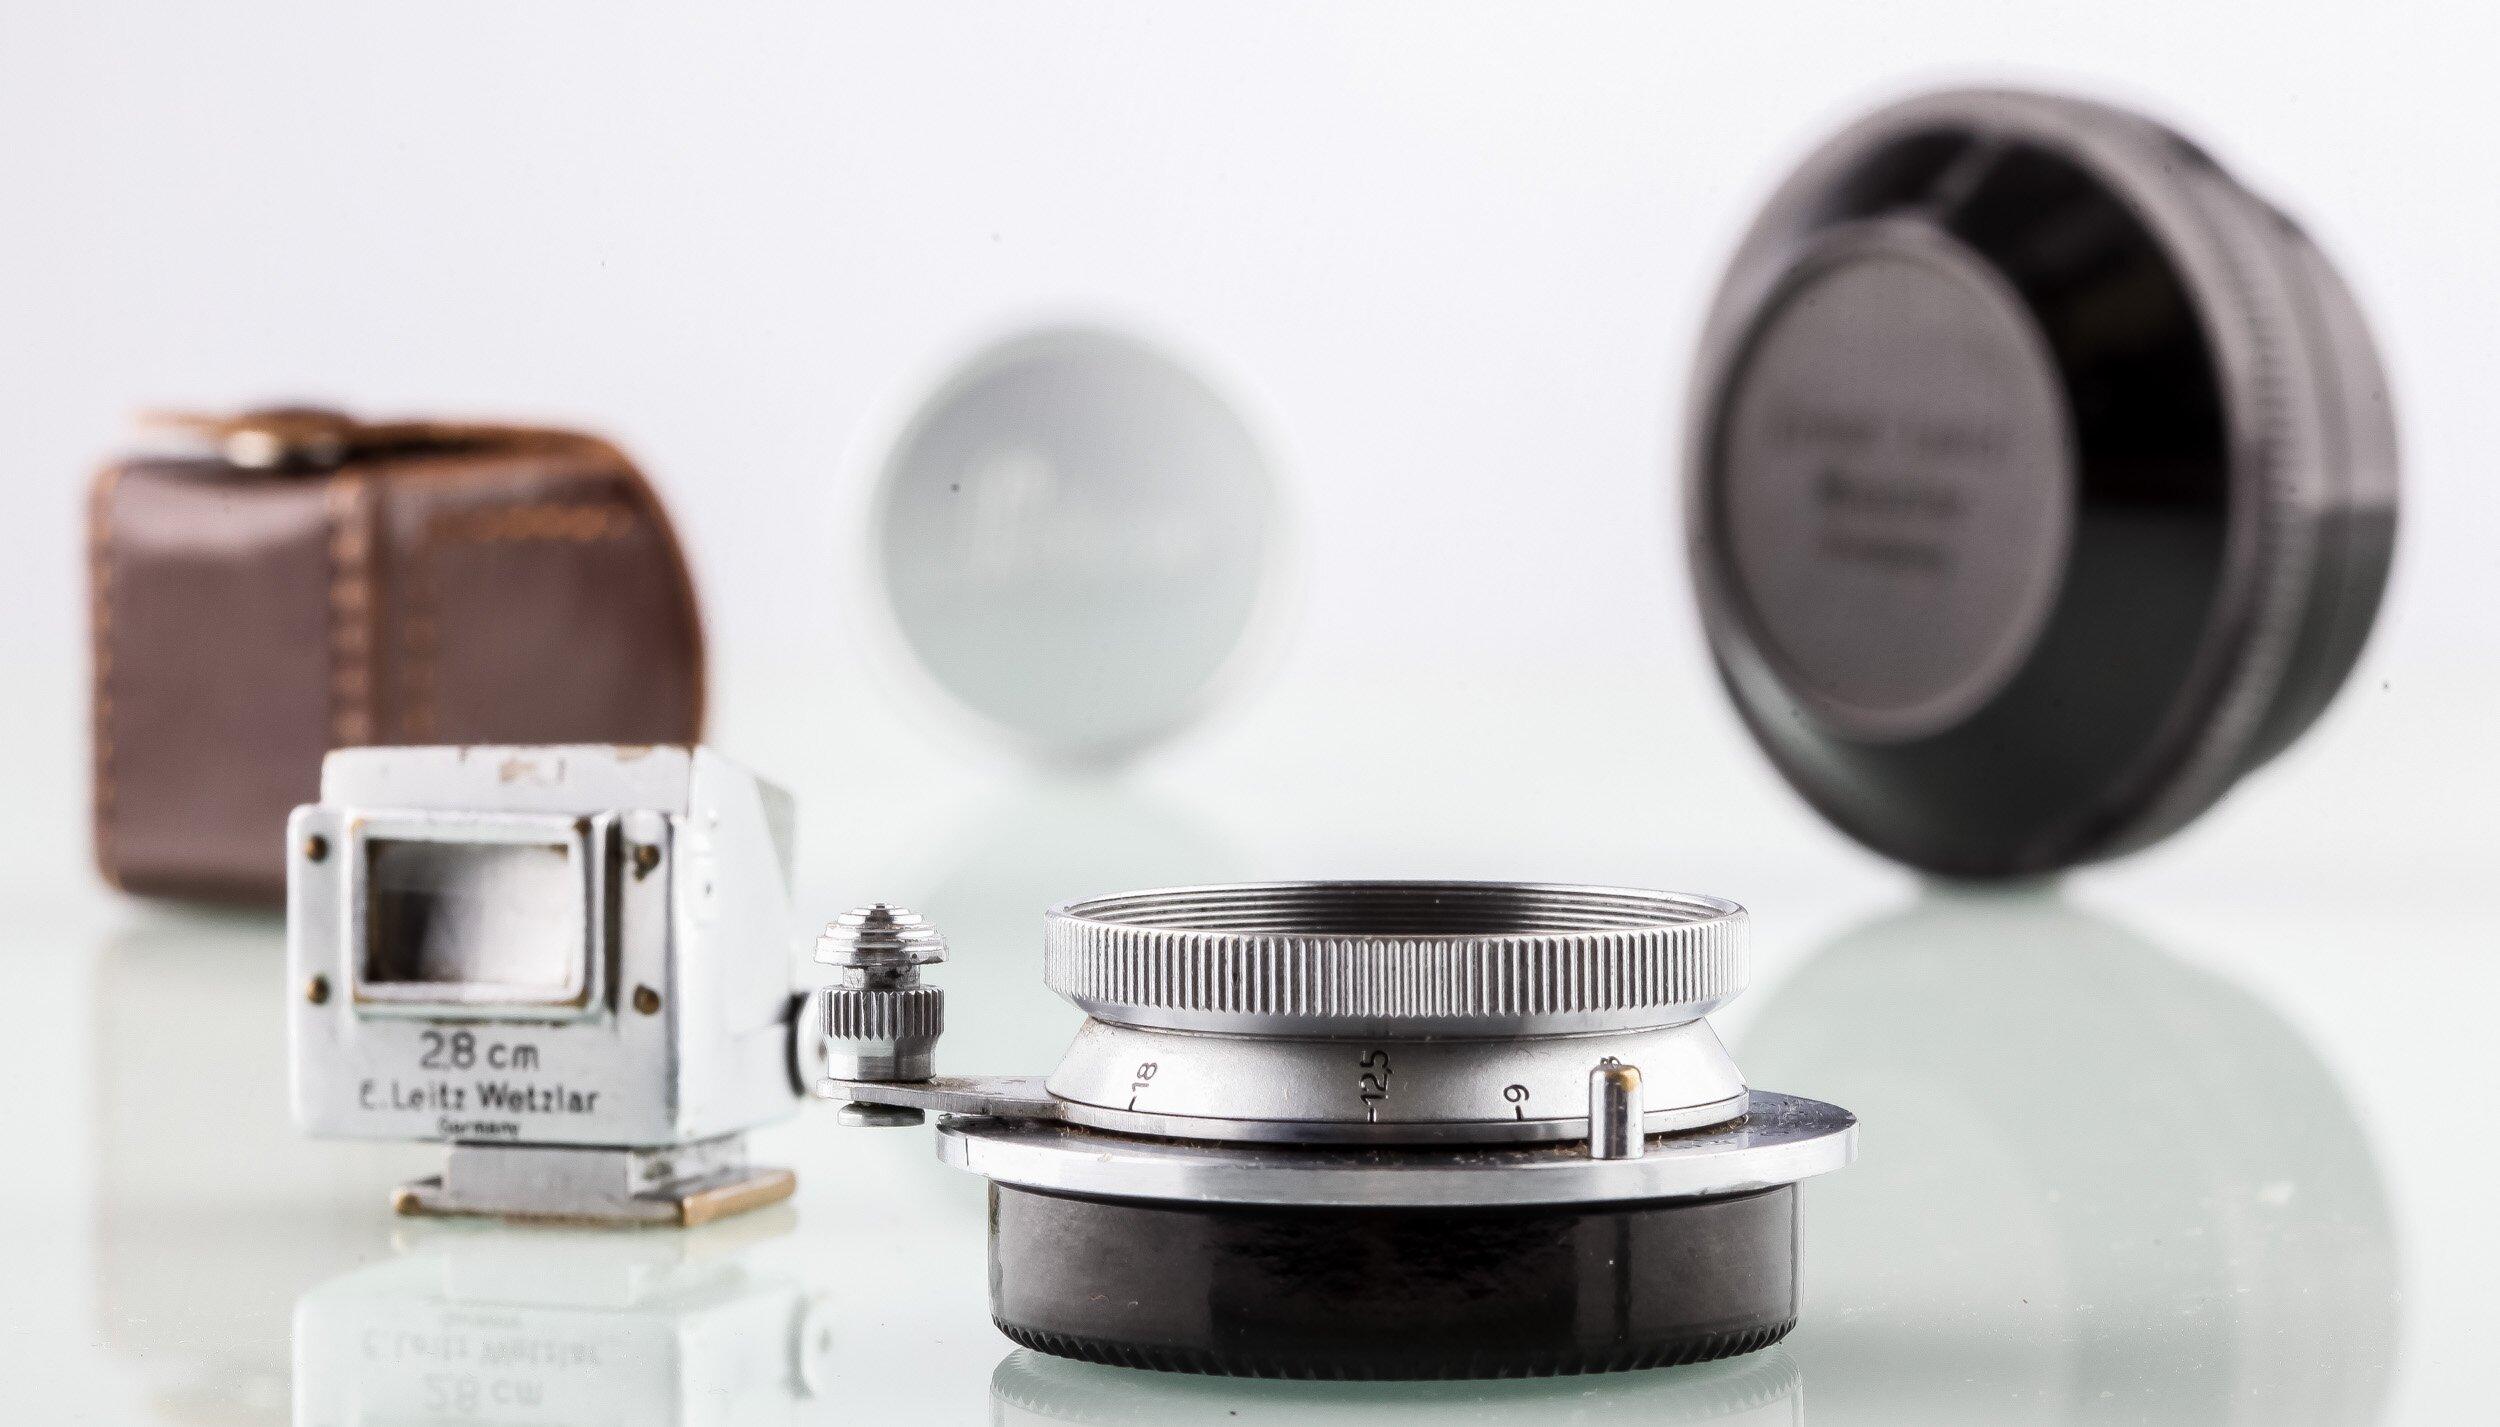 Leica Hektor 2,8cm F6.3 M39